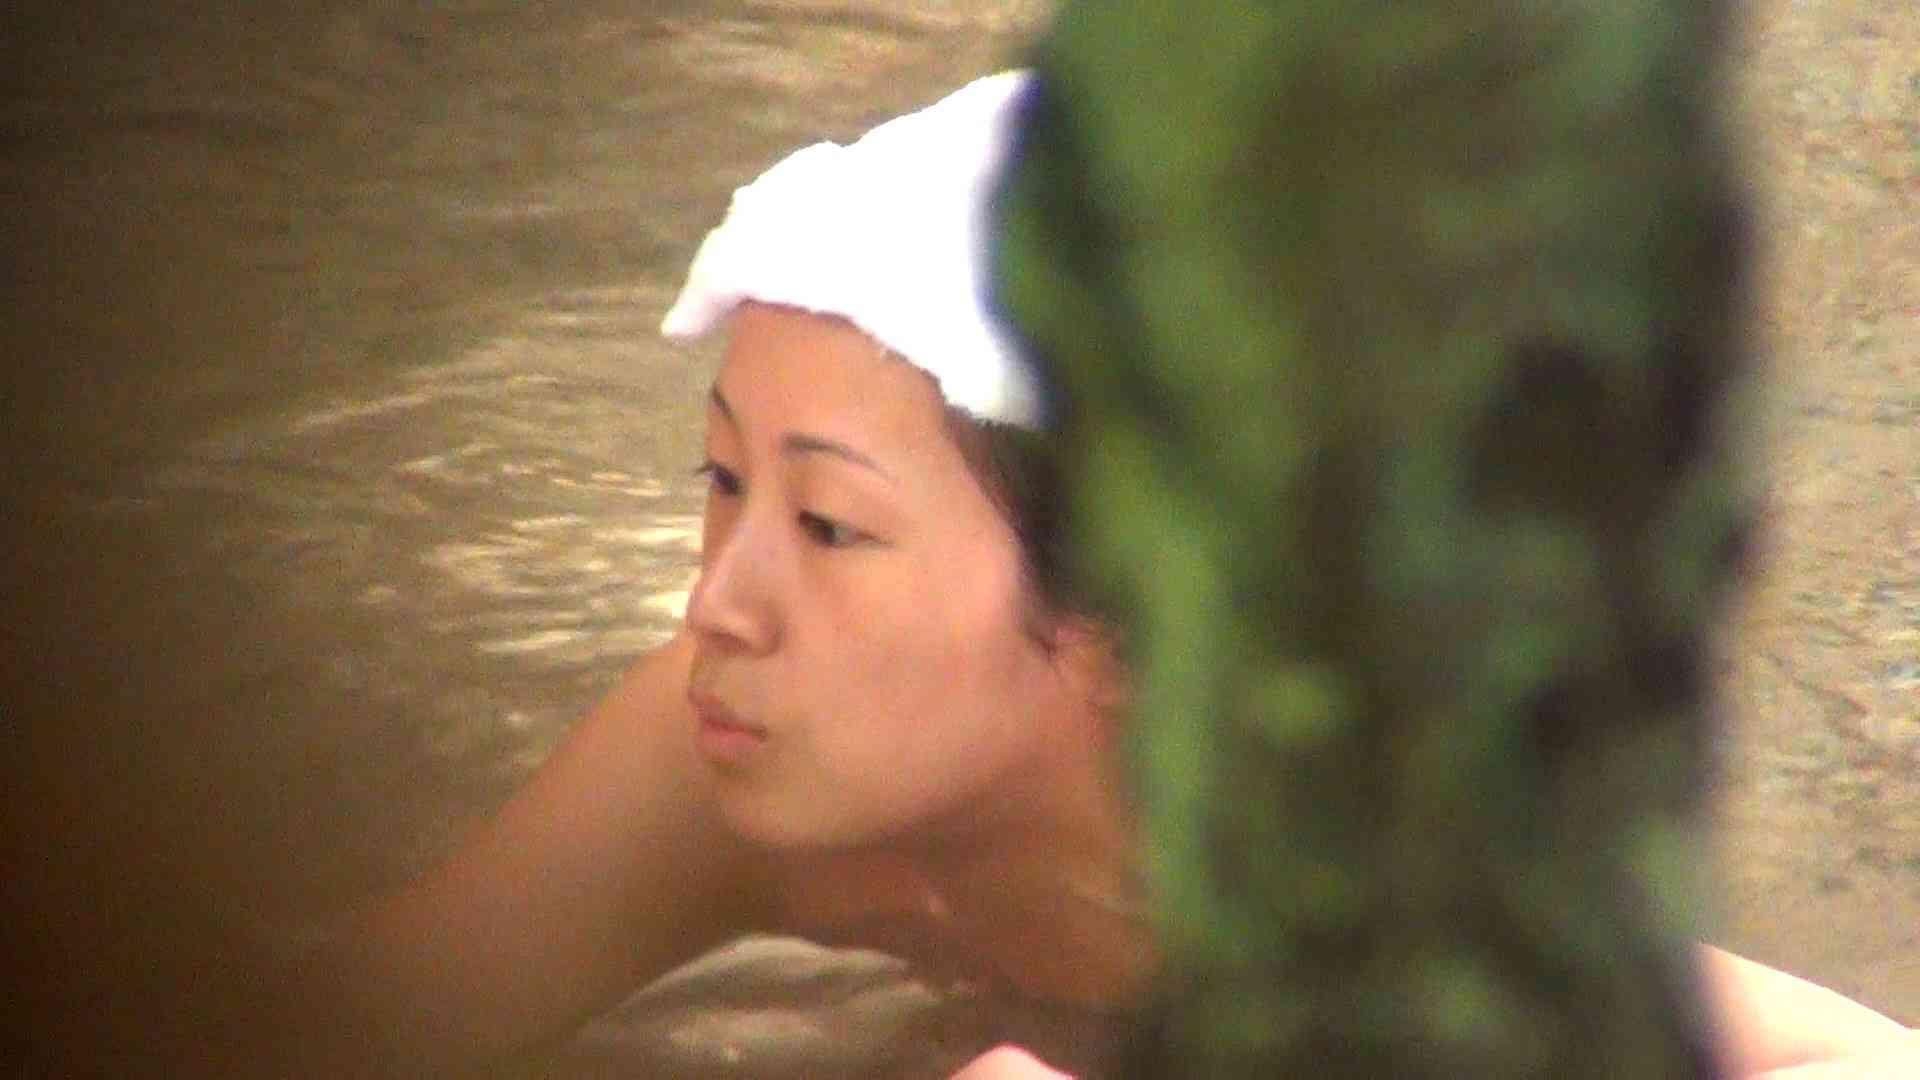 Aquaな露天風呂Vol.281 露天 戯れ無修正画像 78画像 32